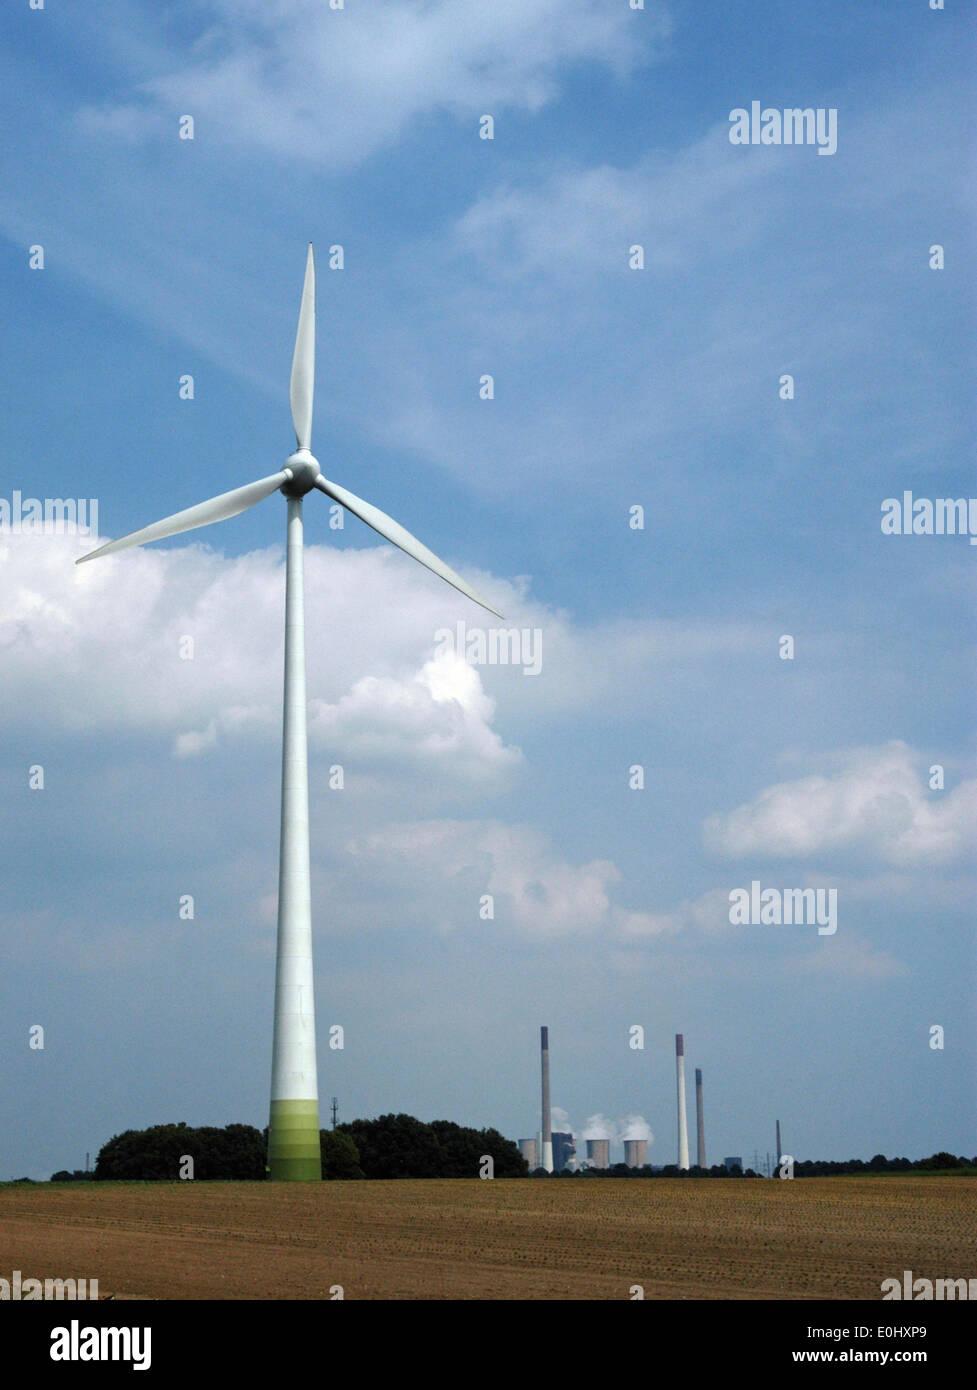 Germania, nei pressi di Colonia, l'energia eolica, la turbina eolica, Deutschland, nahe Köln, Windenergie, Windturbine Immagini Stock